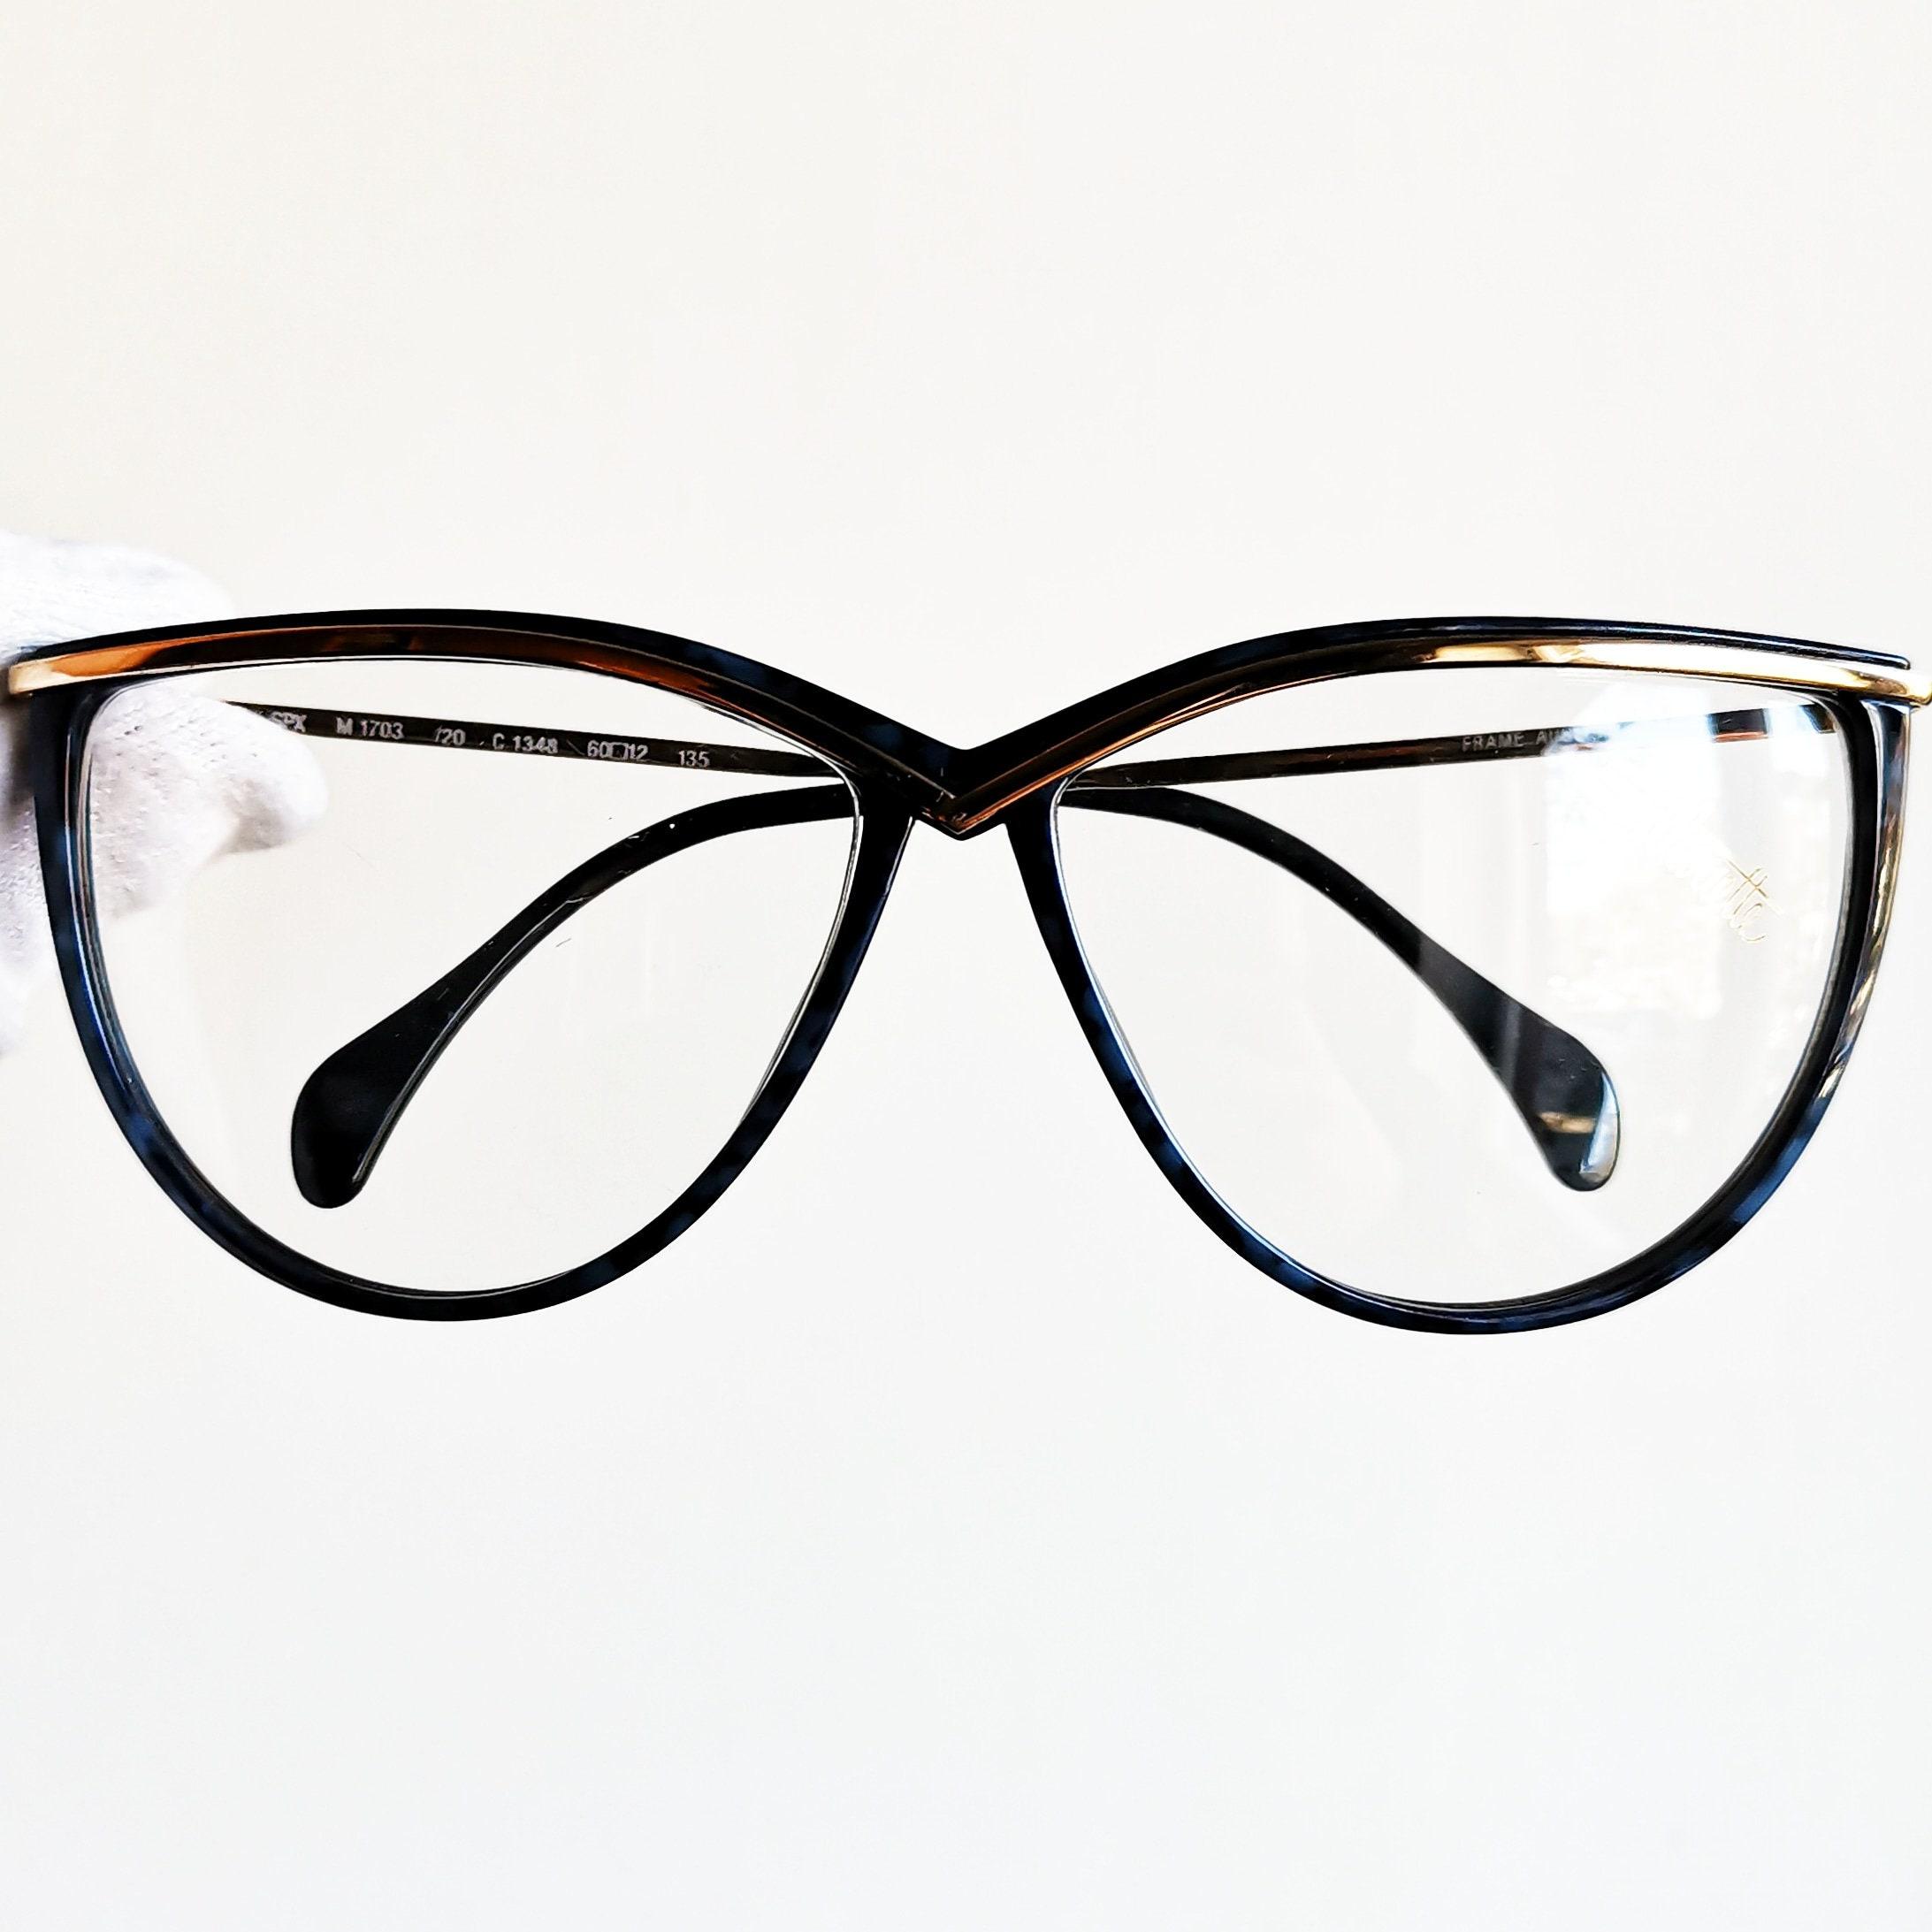 78edf92ee121 SILHOUETTE vintage eyeglasses rare eyewear oversize big blue